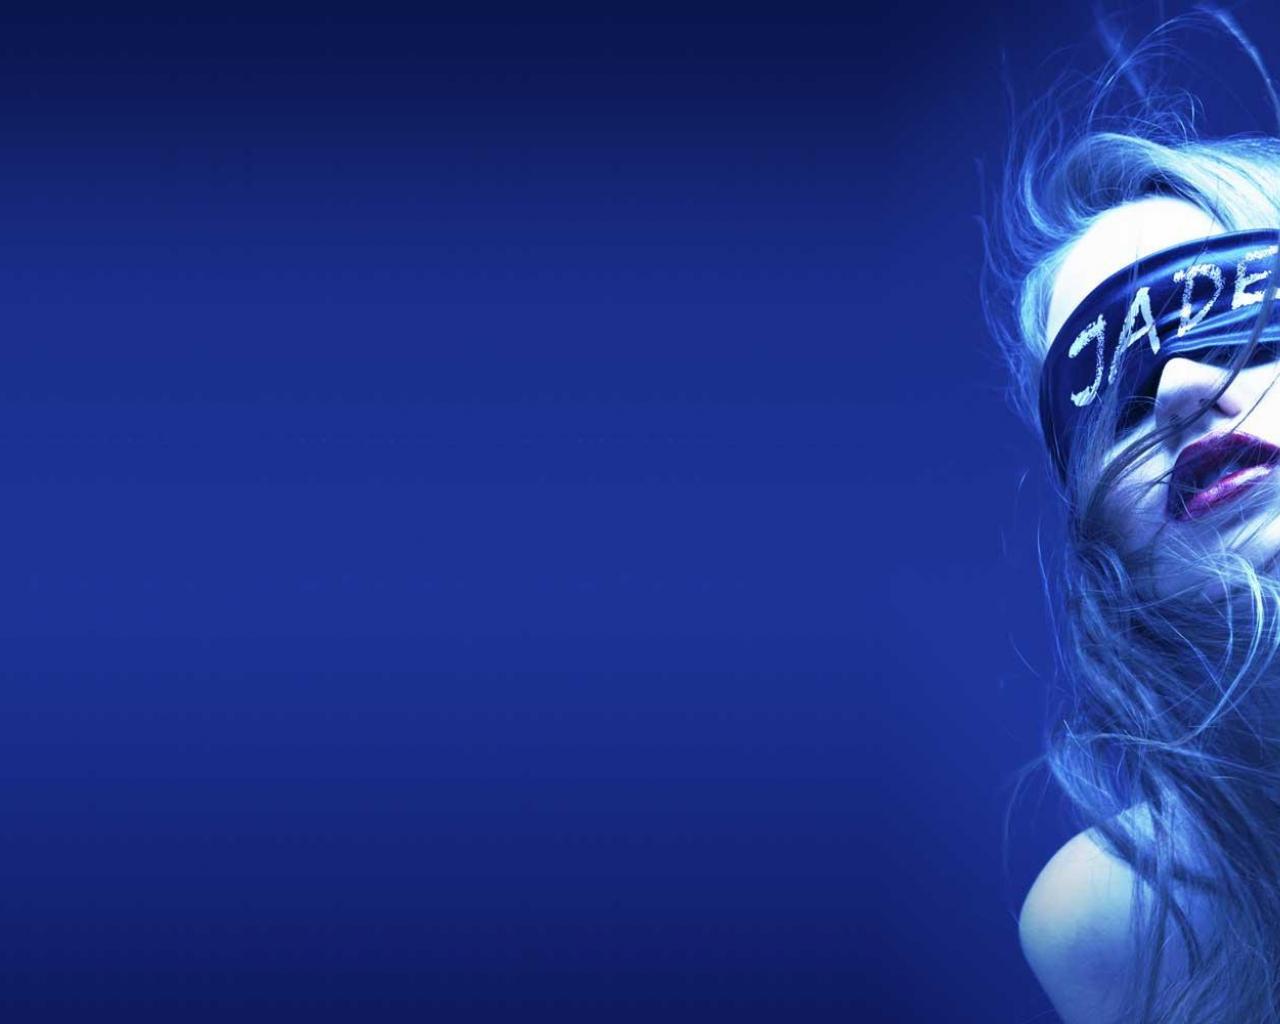 Album covers Blindfold X japan HD Wallpapers Desktop 1280x1024